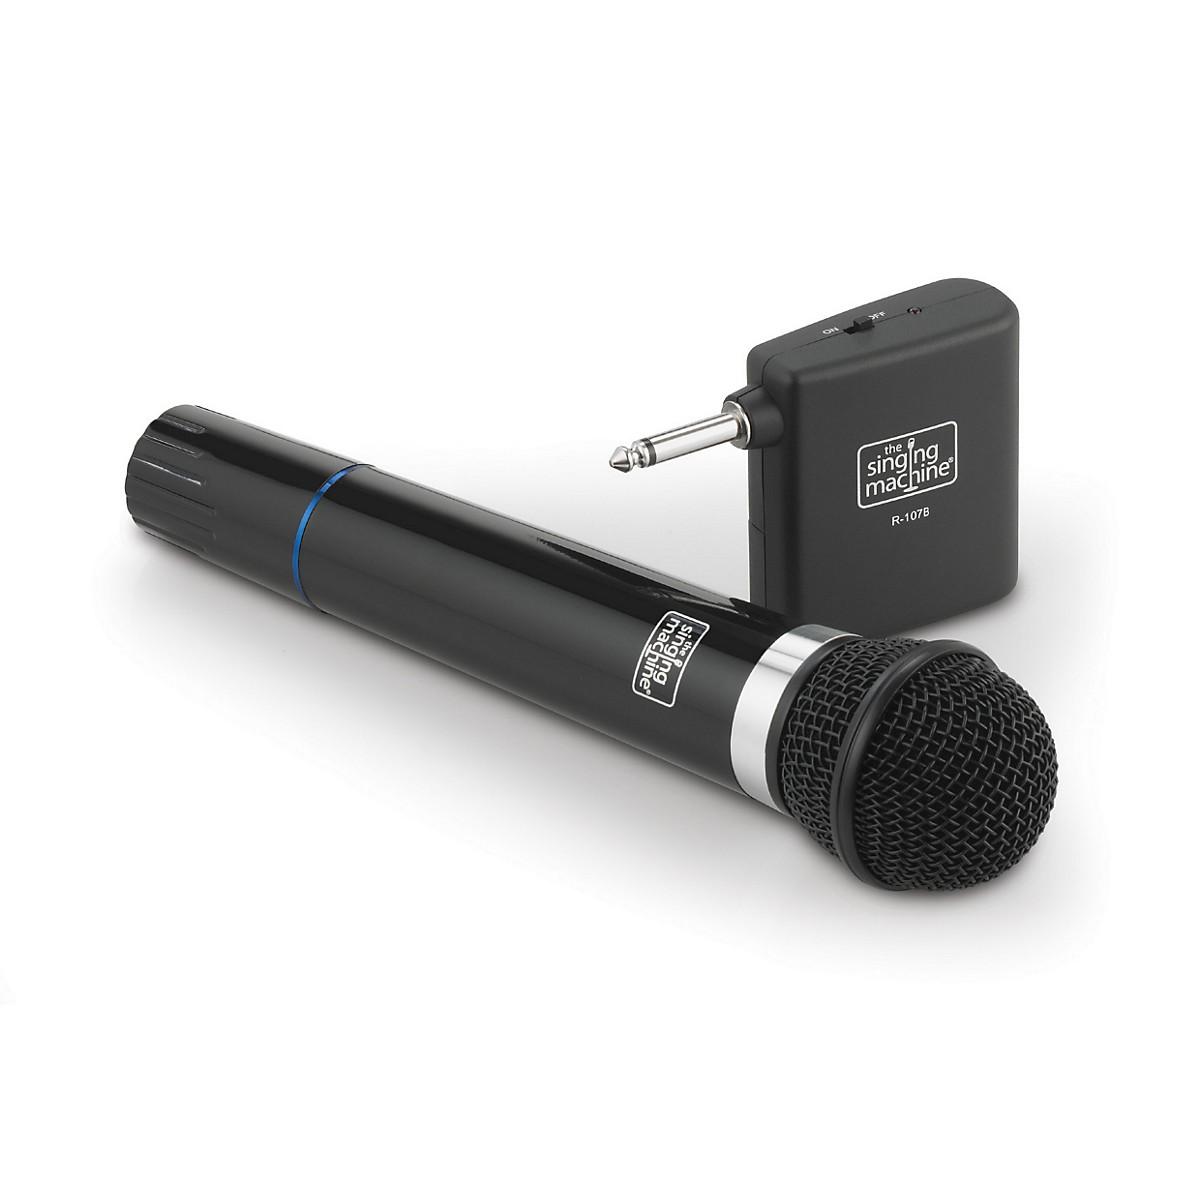 The Singing Machine Karaoke Wireless Microphone